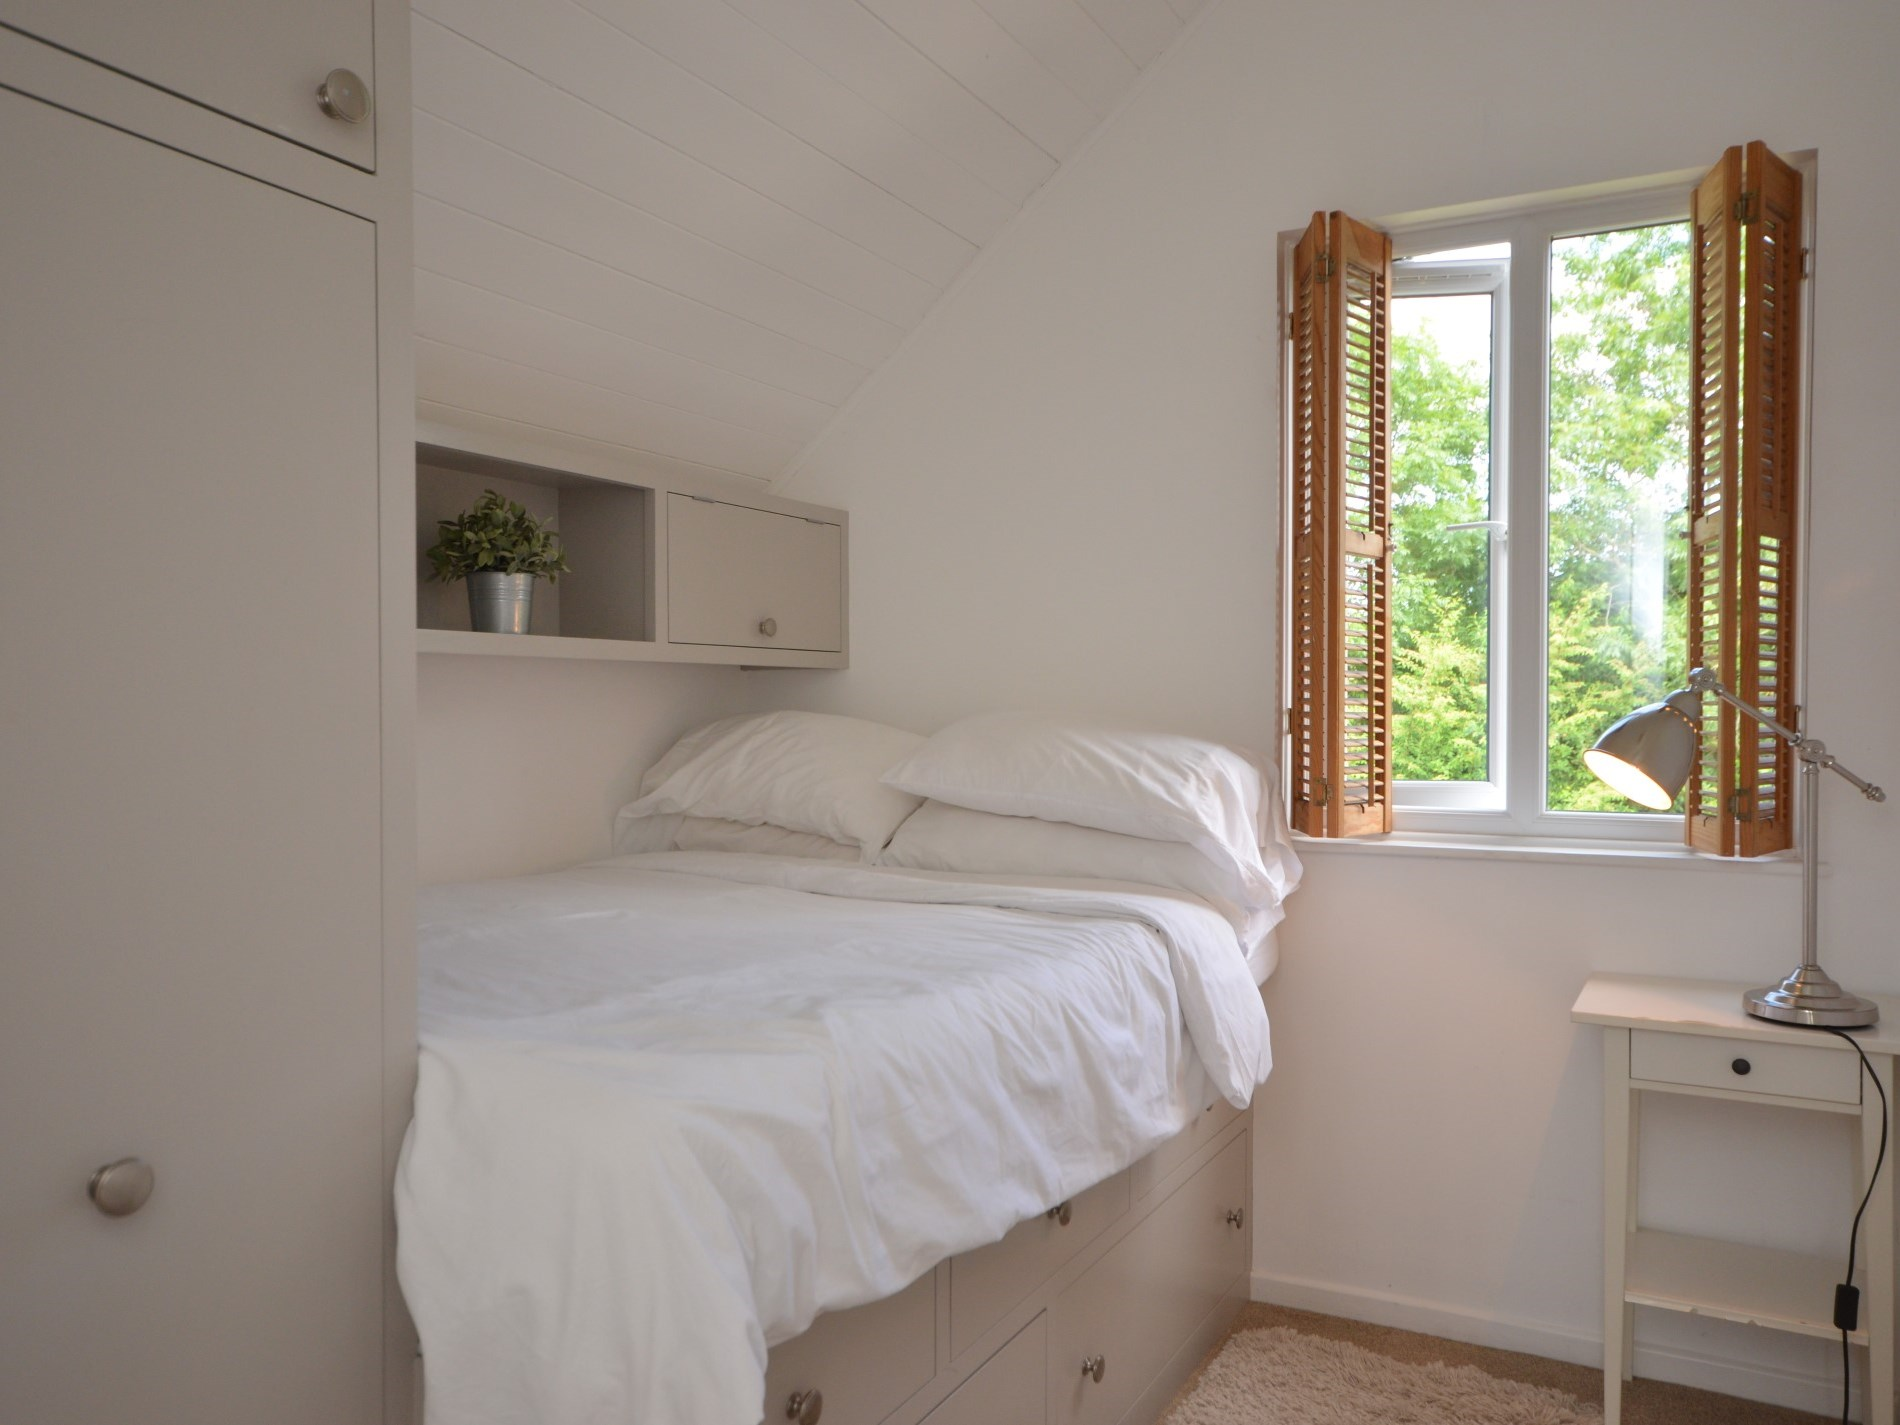 4 foot double bedroom with built in storage